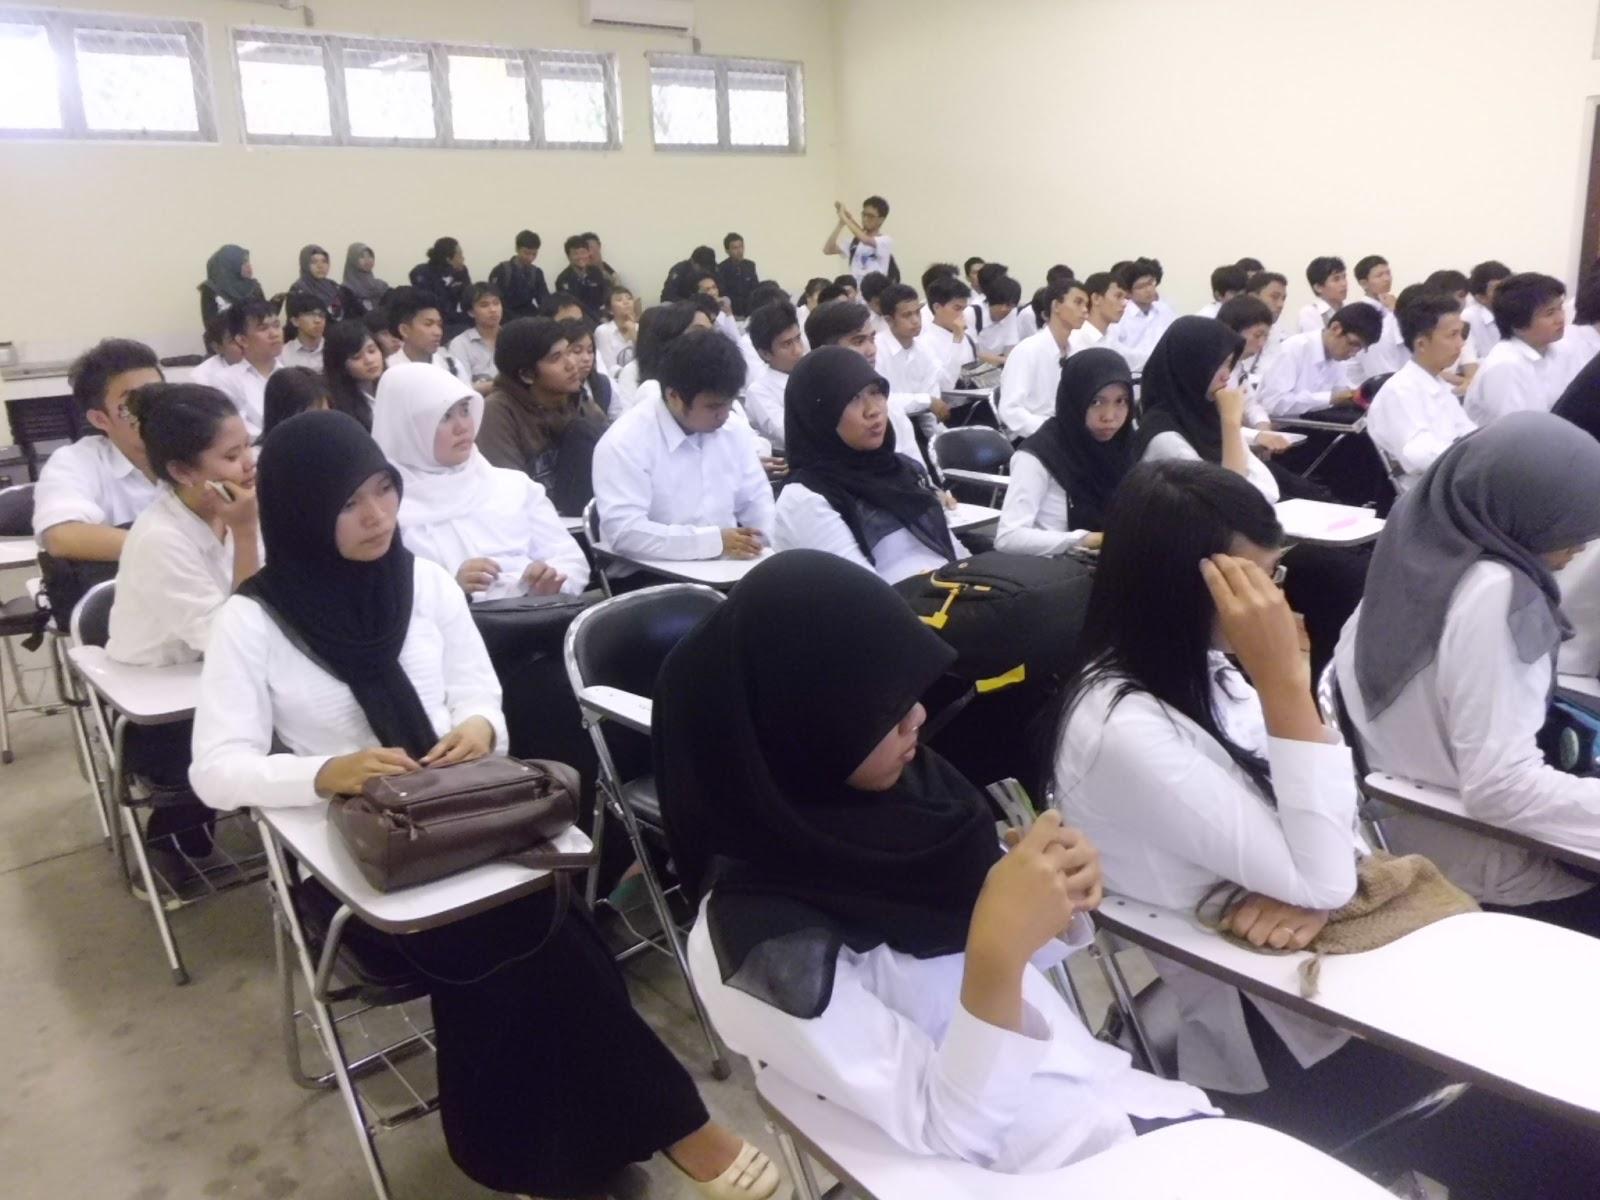 Lowongan Kerja 2019 PT ASTRA DAIHATSU MOTOR INDONESIA ADM